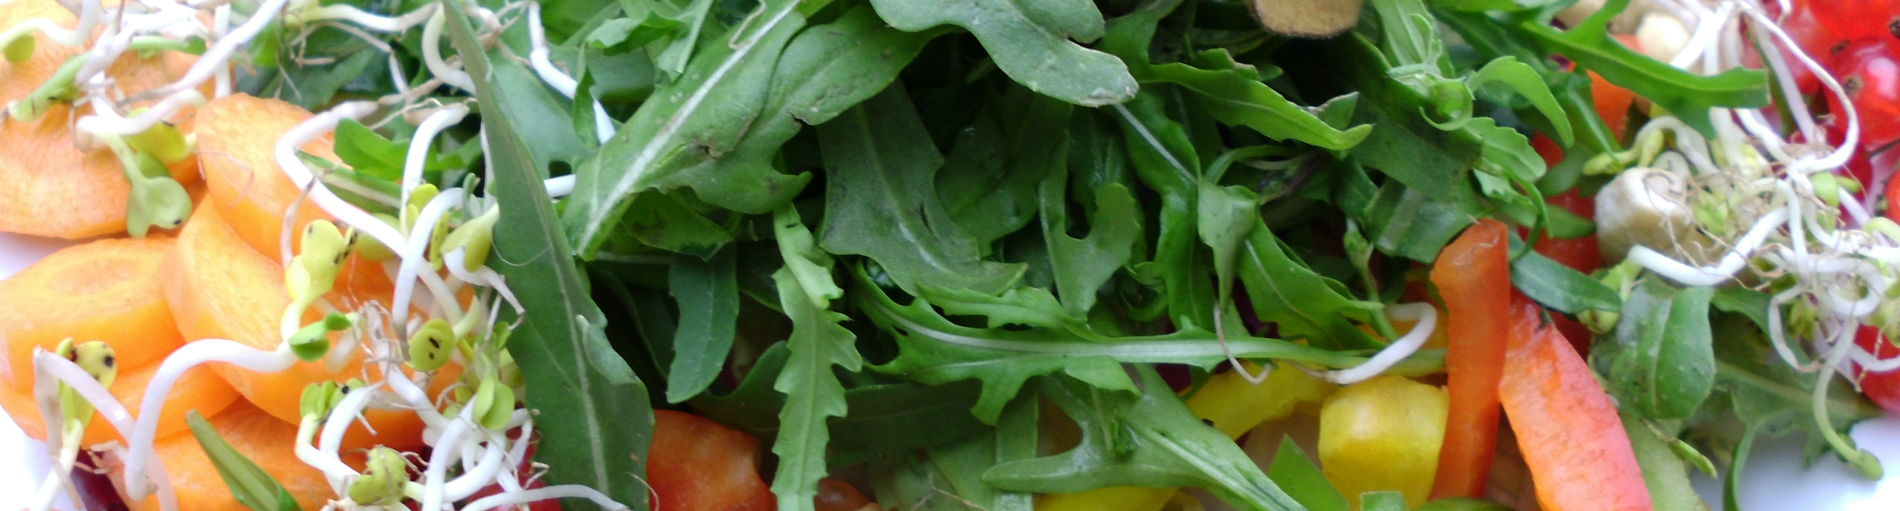 Salat (Quelle: K. Bünn/bremen.online GmbH)